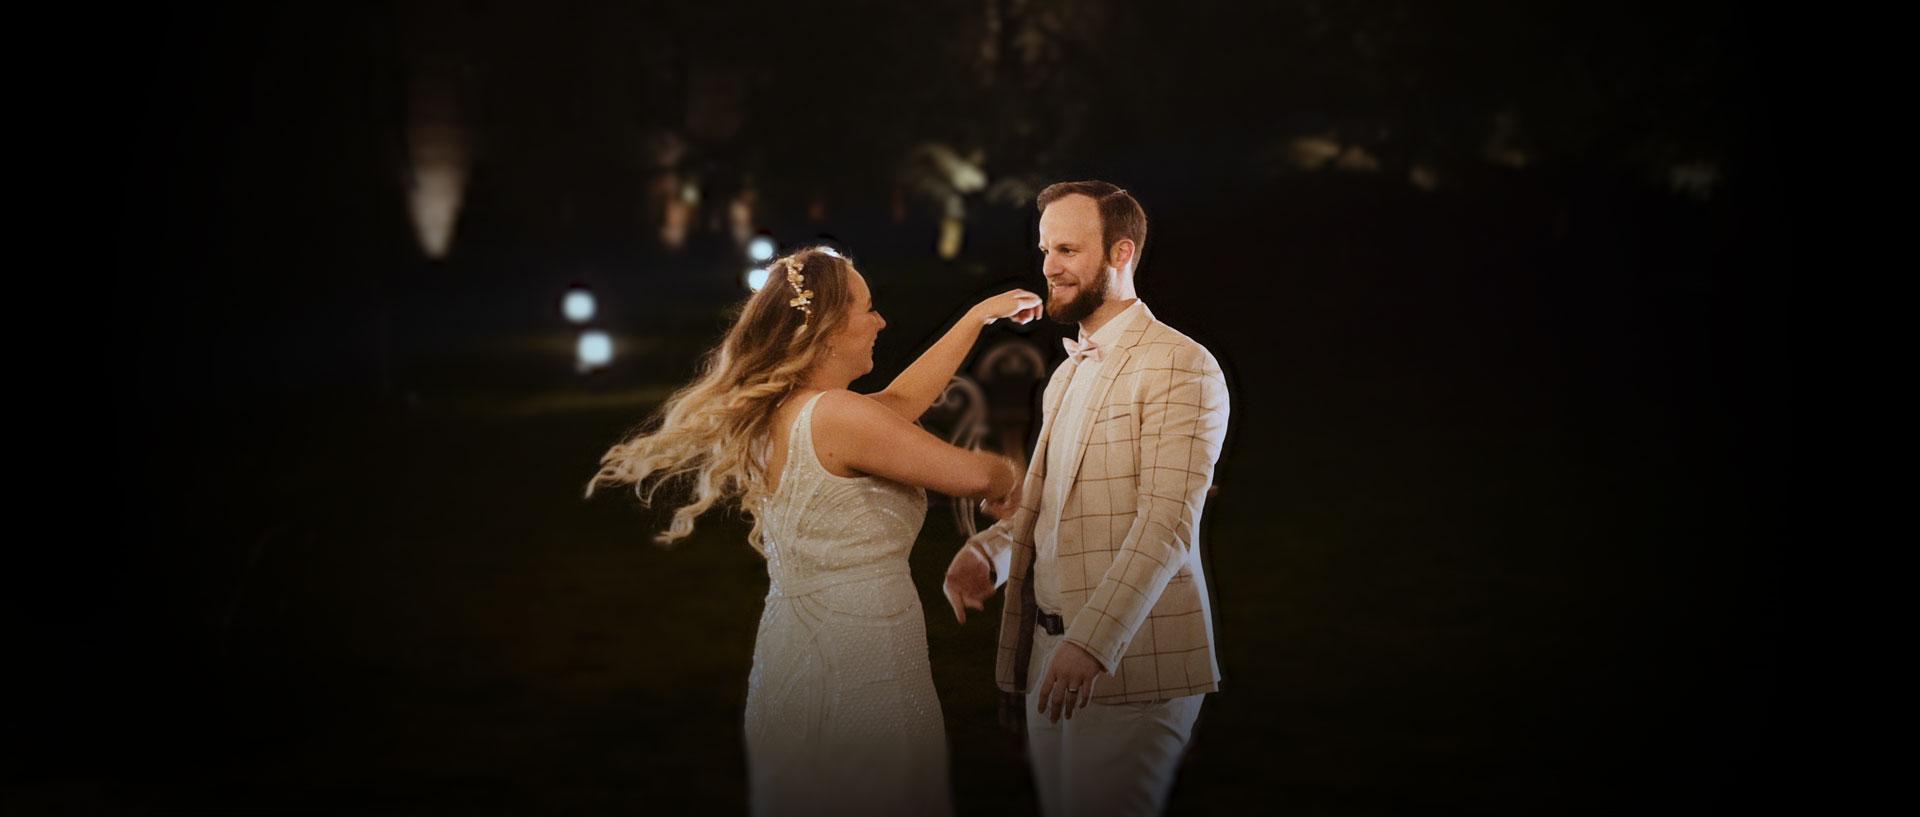 Hannah & Philip - An emotional and rock'n roll english wedding in South West of FranceDomaine de Beyssac - Cintegabelle